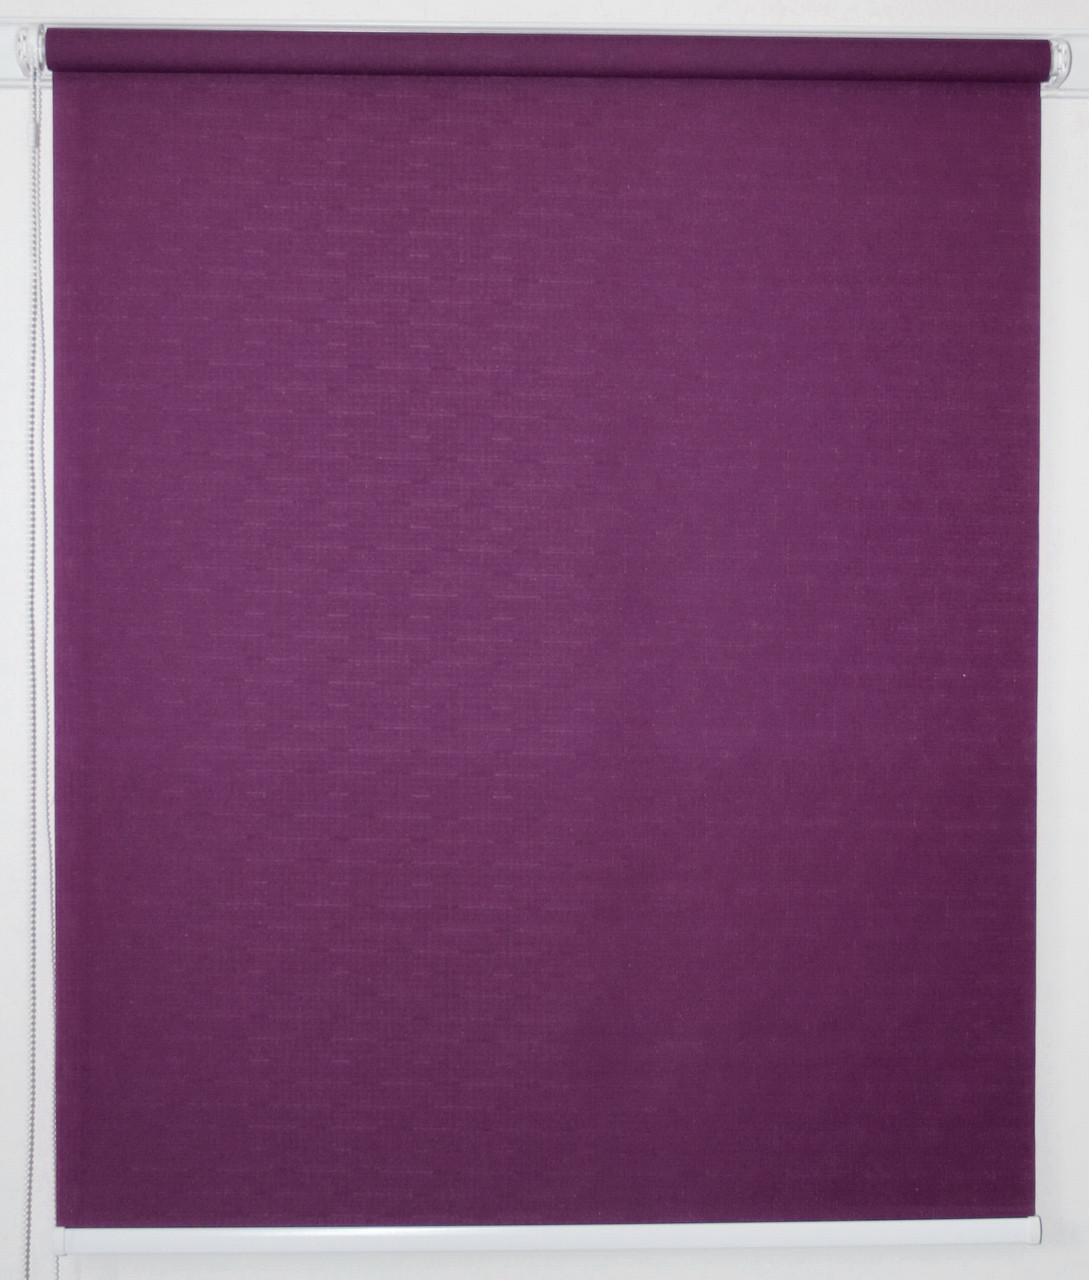 Рулонная штора 575*1500 Лён 613 Фиолетовый